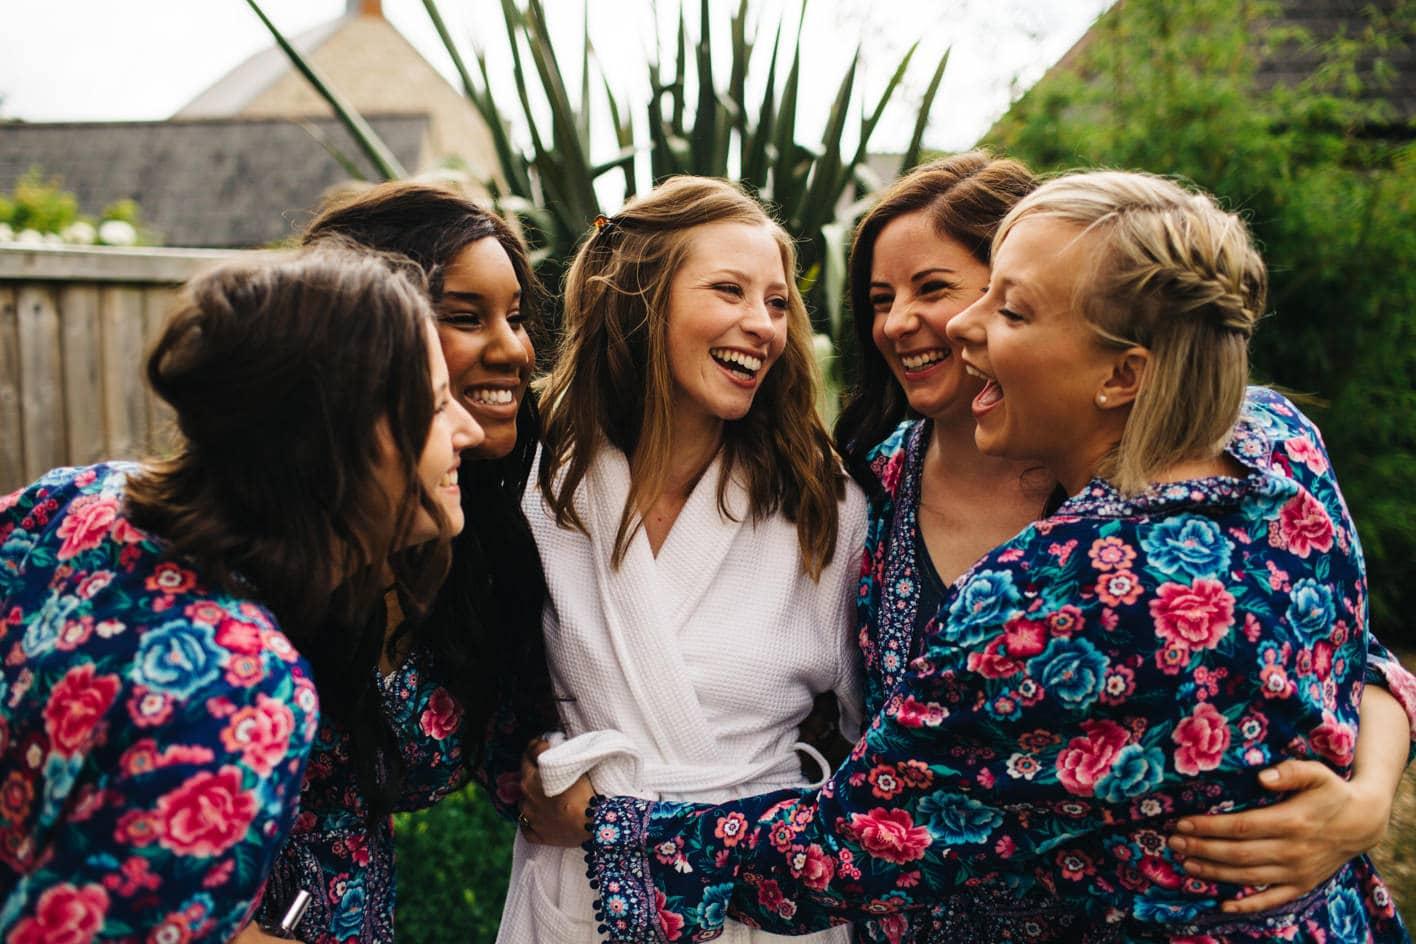 brides and bridesmaids hug before wedding